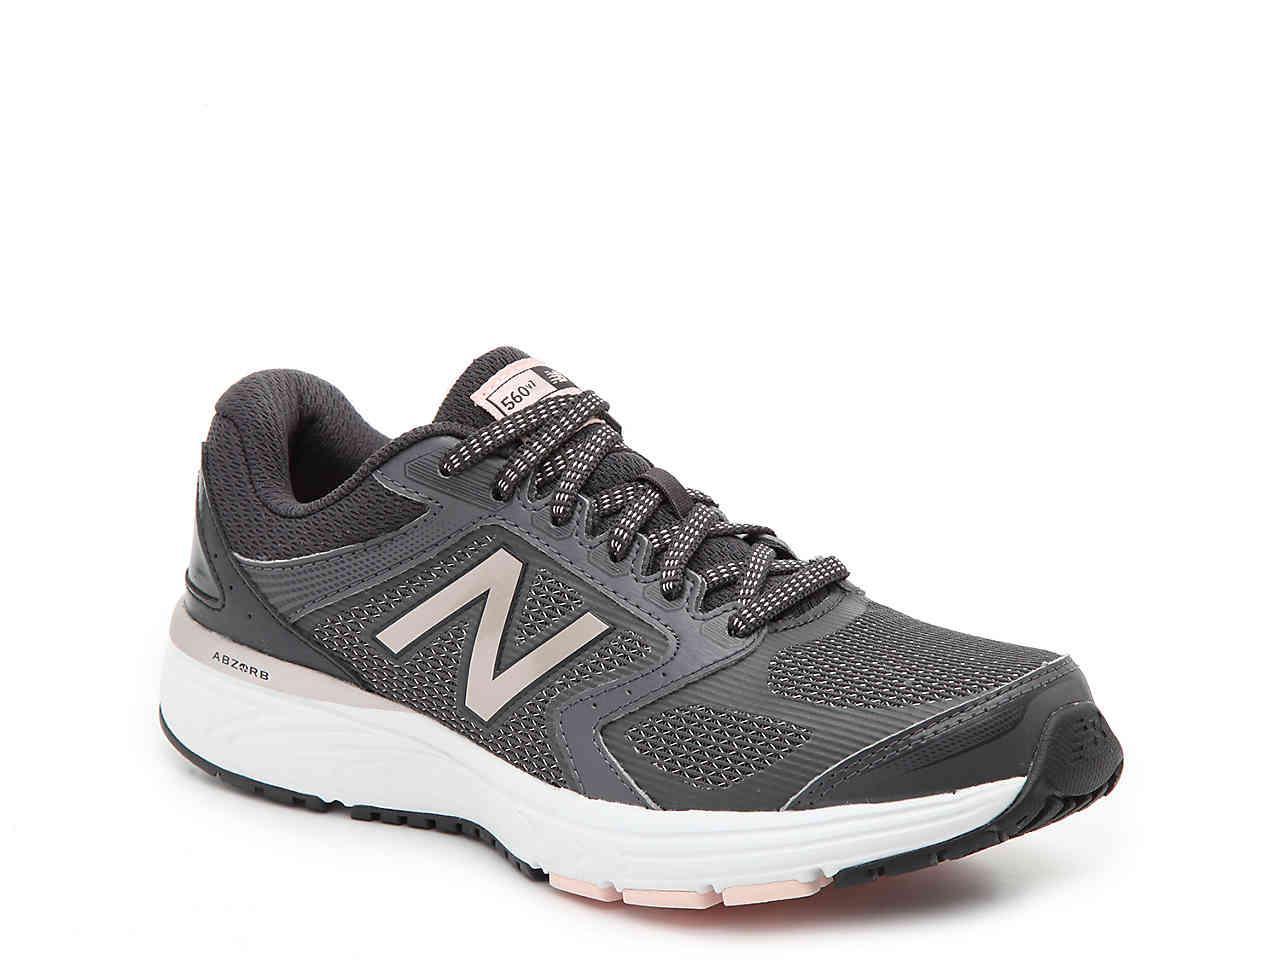 90e0d82143d1a uk athletic cross training nike dual fusion hit training shoe dsw 358872  d175b eb674  australia lyst new balance 560 v7 running shoe ca4c8 99cad